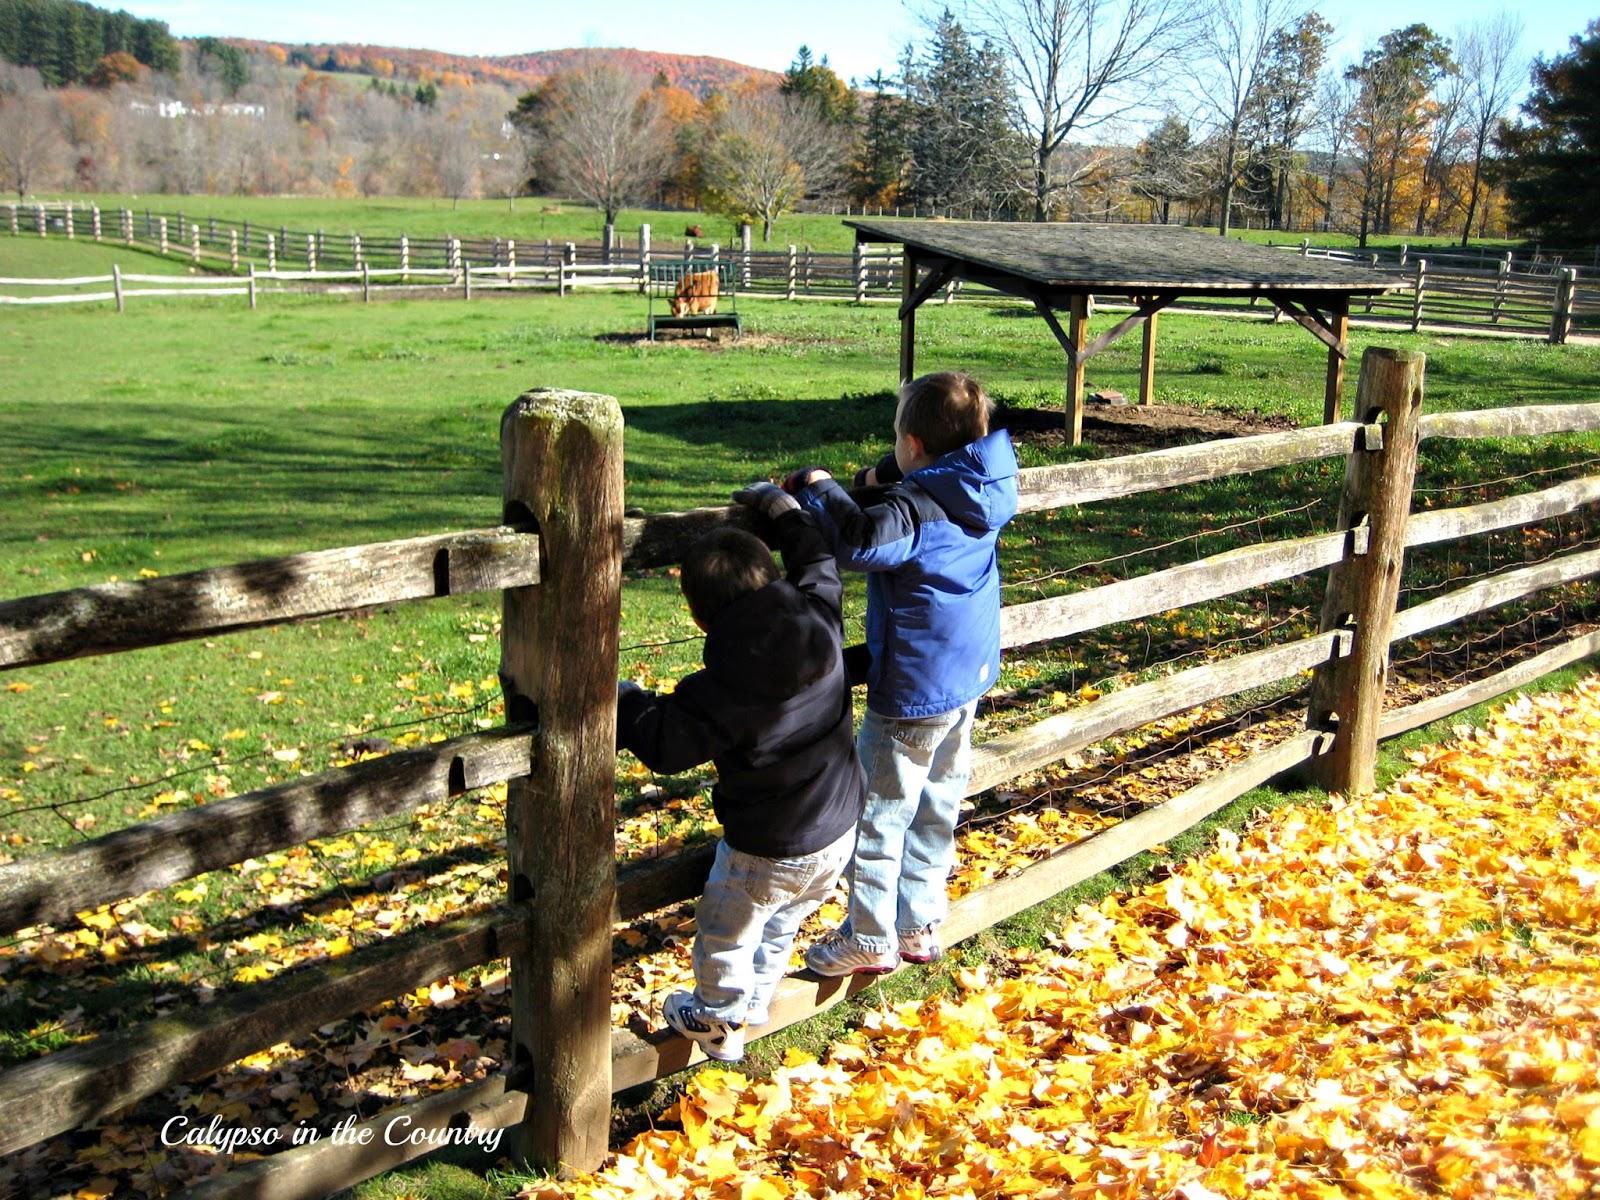 Vermont farm scene - boys climbing the fence